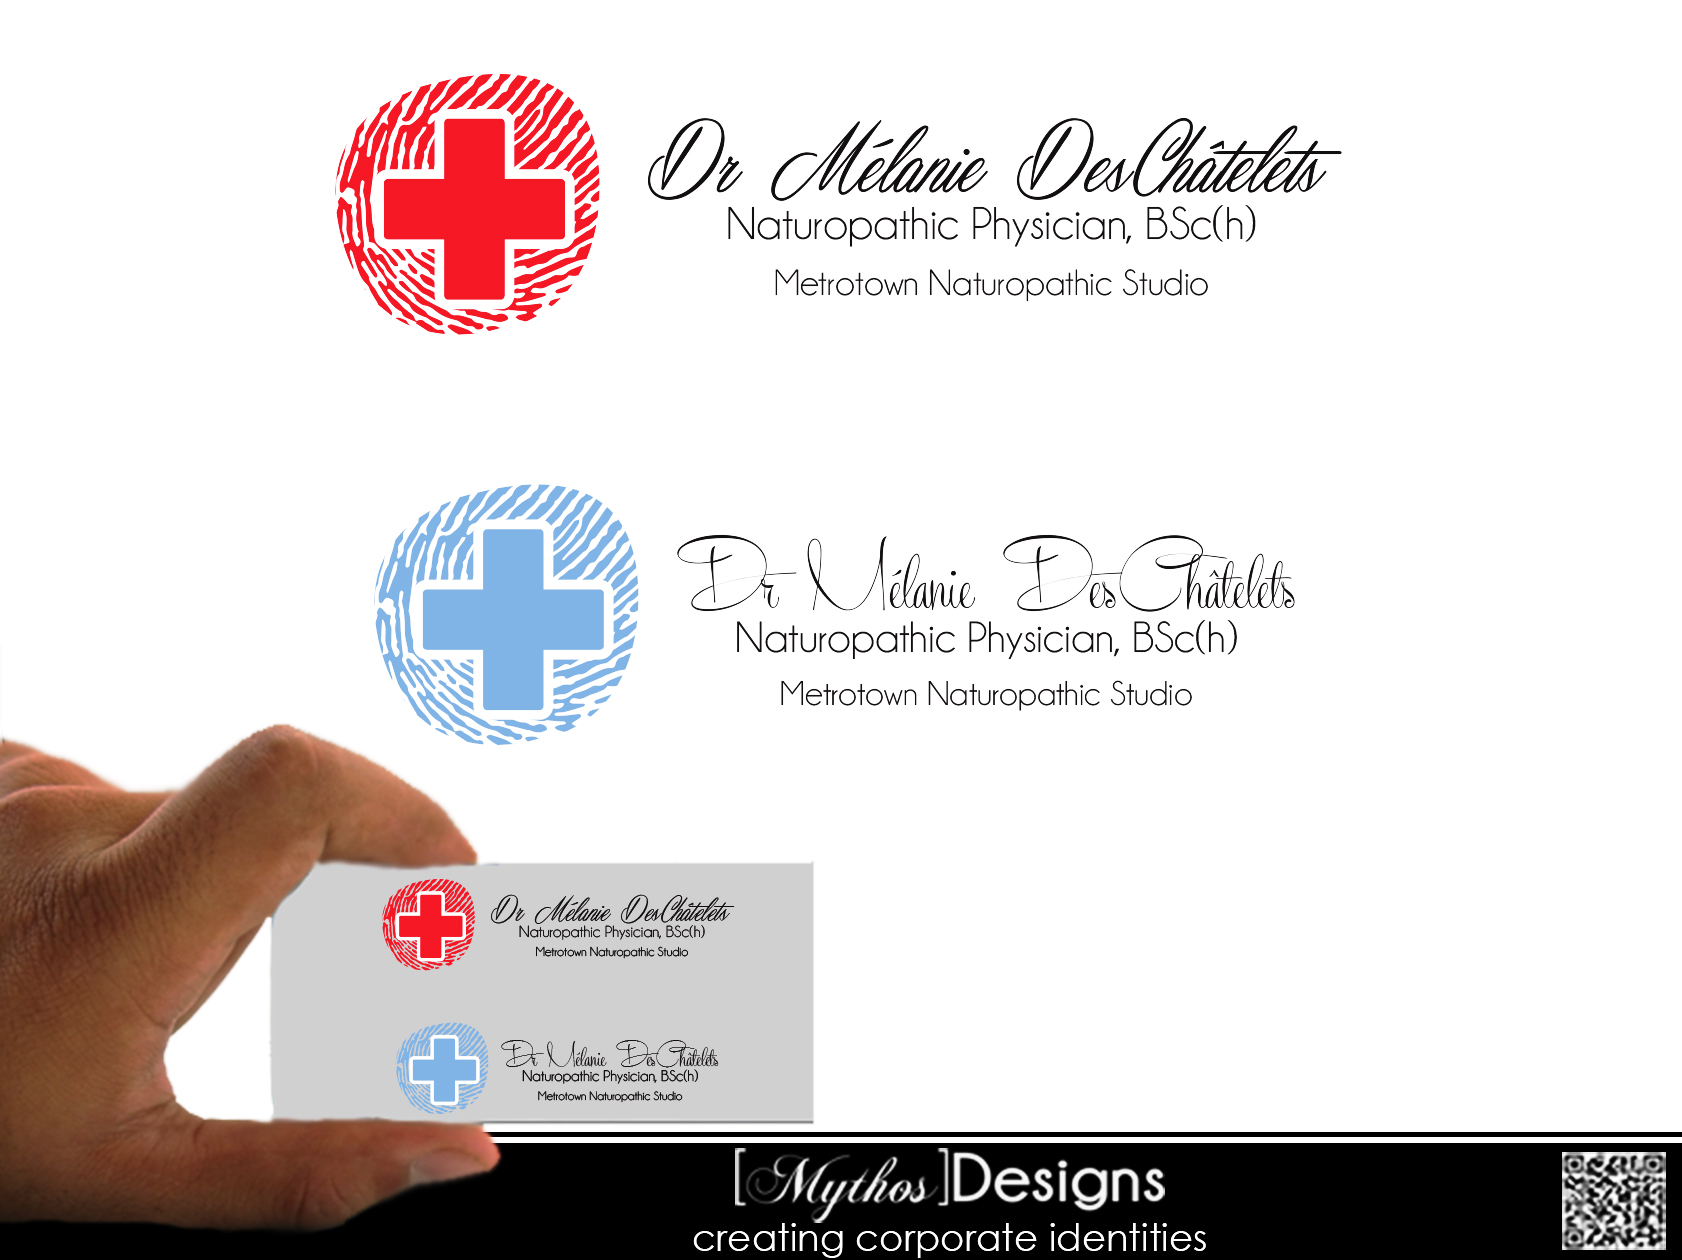 Logo Design by Mythos Designs - Entry No. 172 in the Logo Design Contest Artistic Logo Design for Dr Mélanie DesChâtelets.